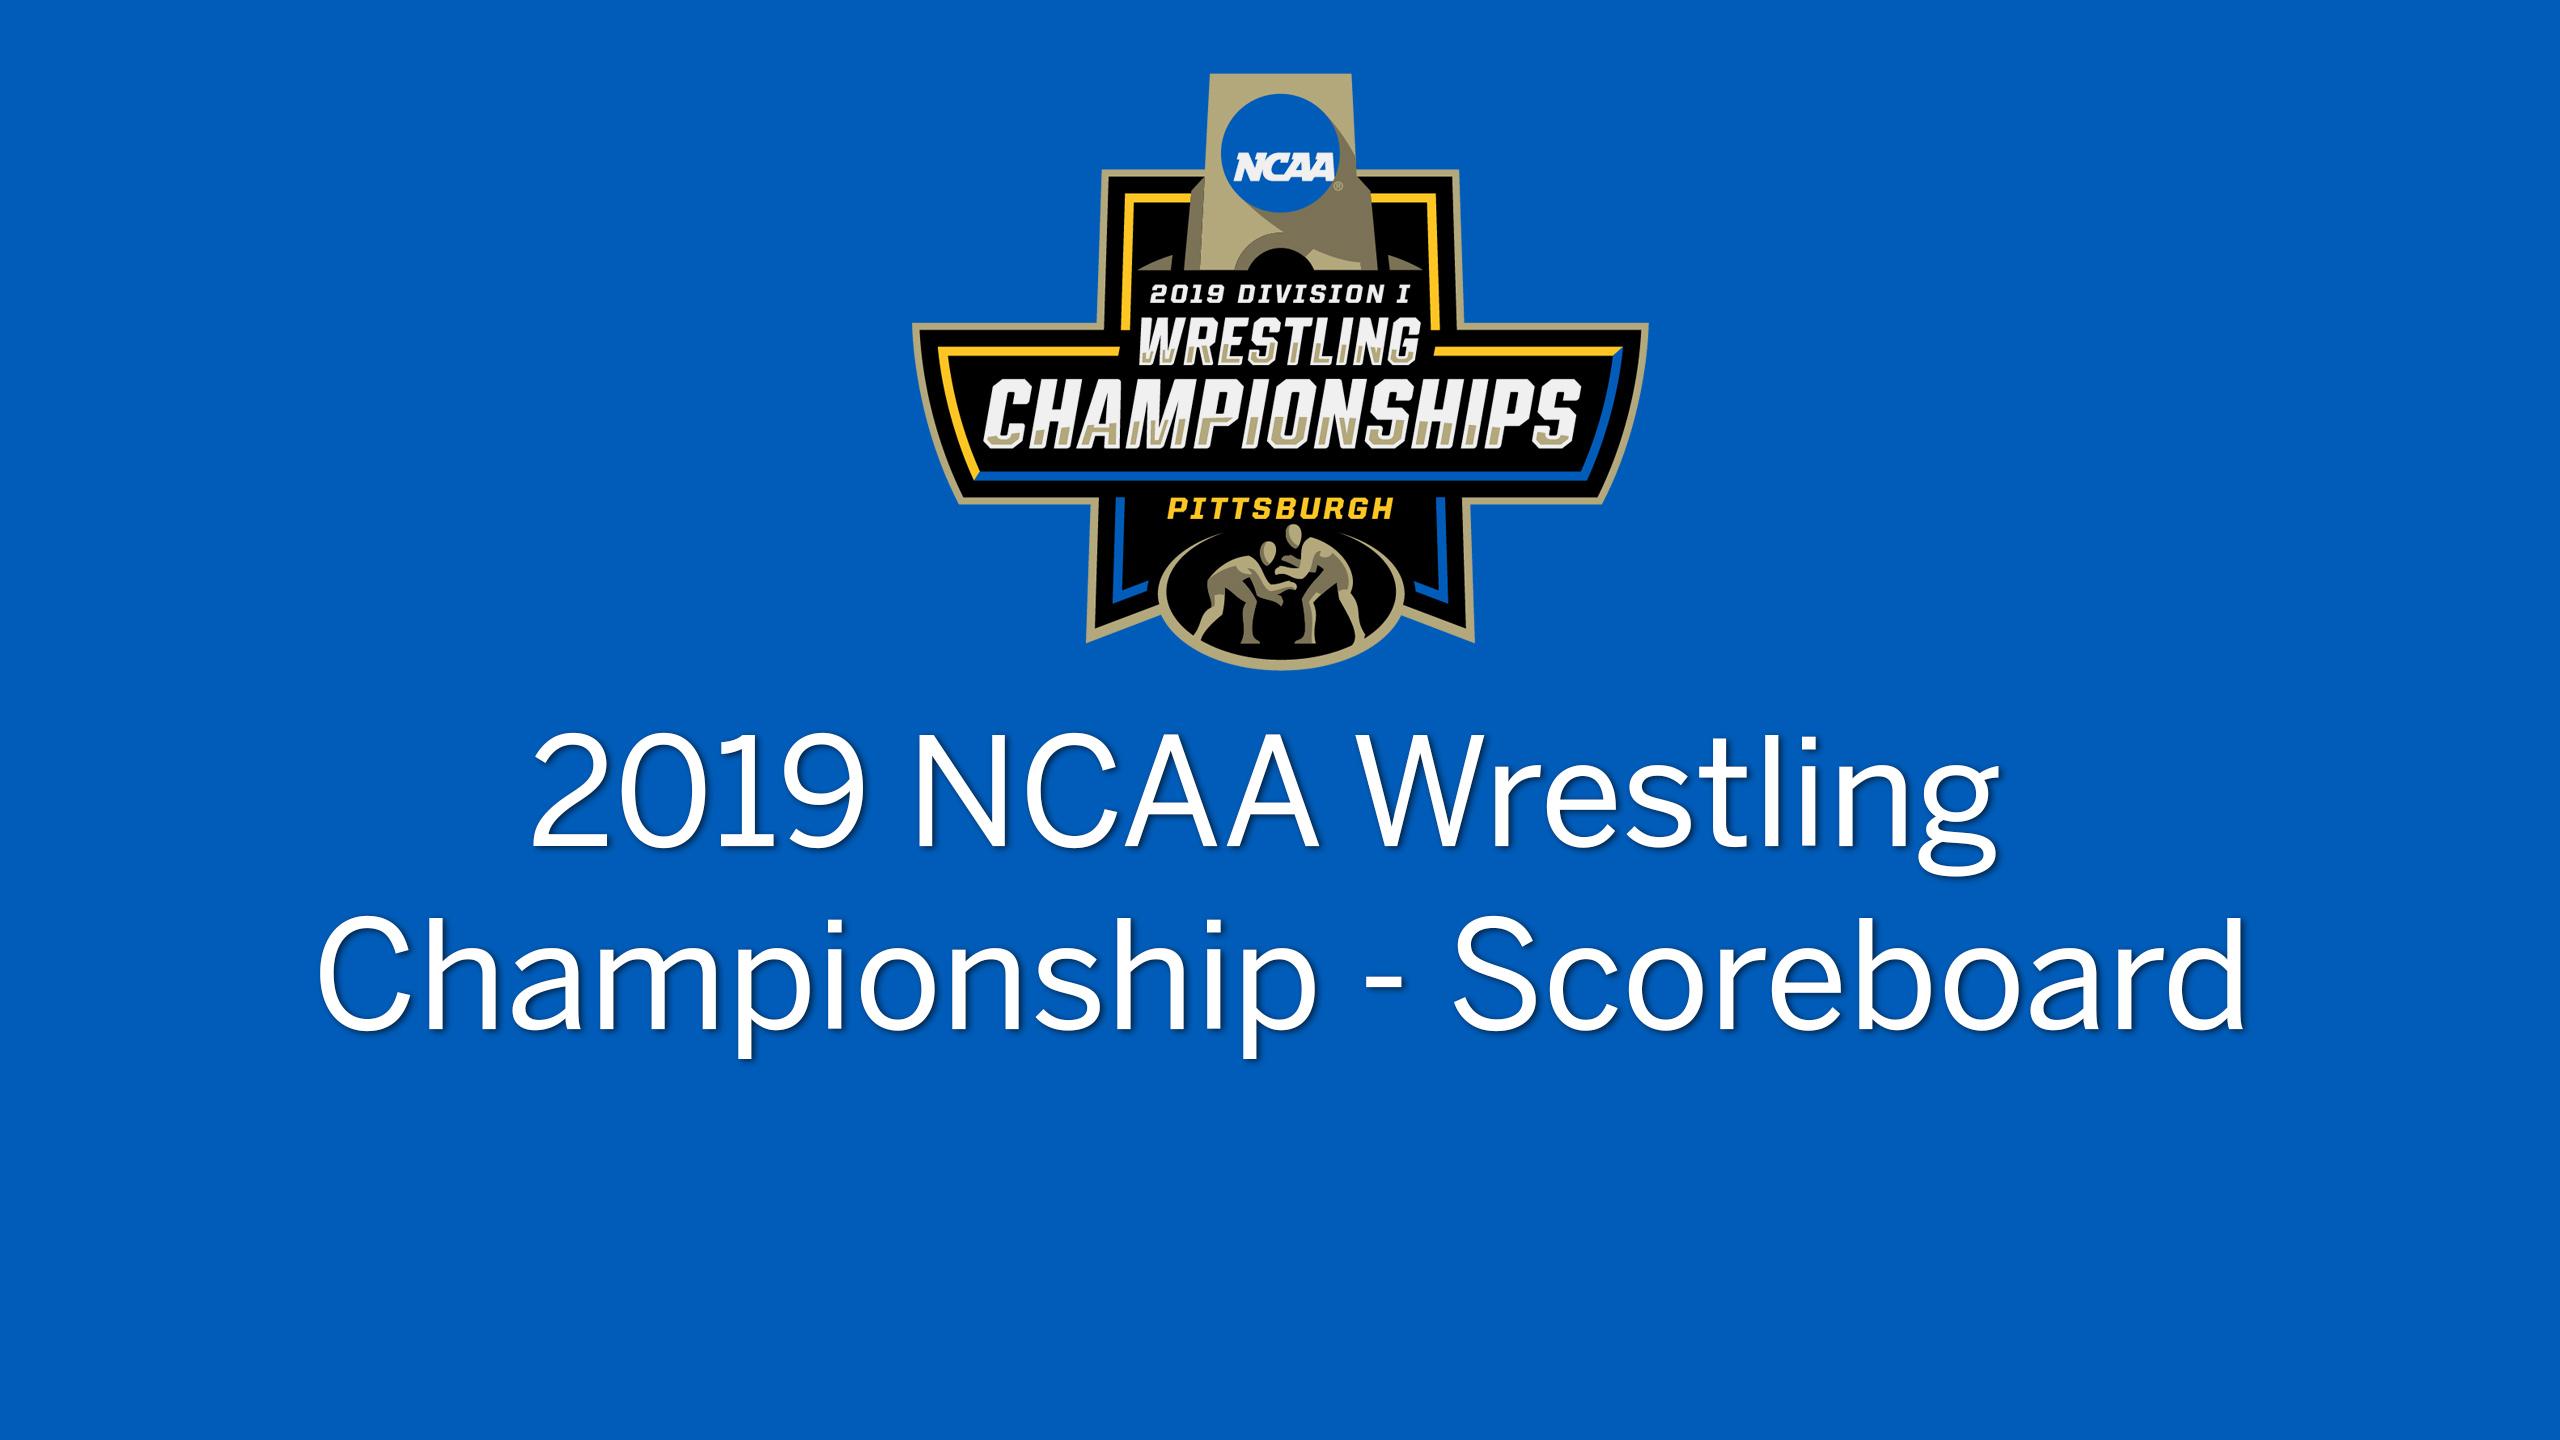 NCAA Wrestling Championship (Scoreboard - First Round)